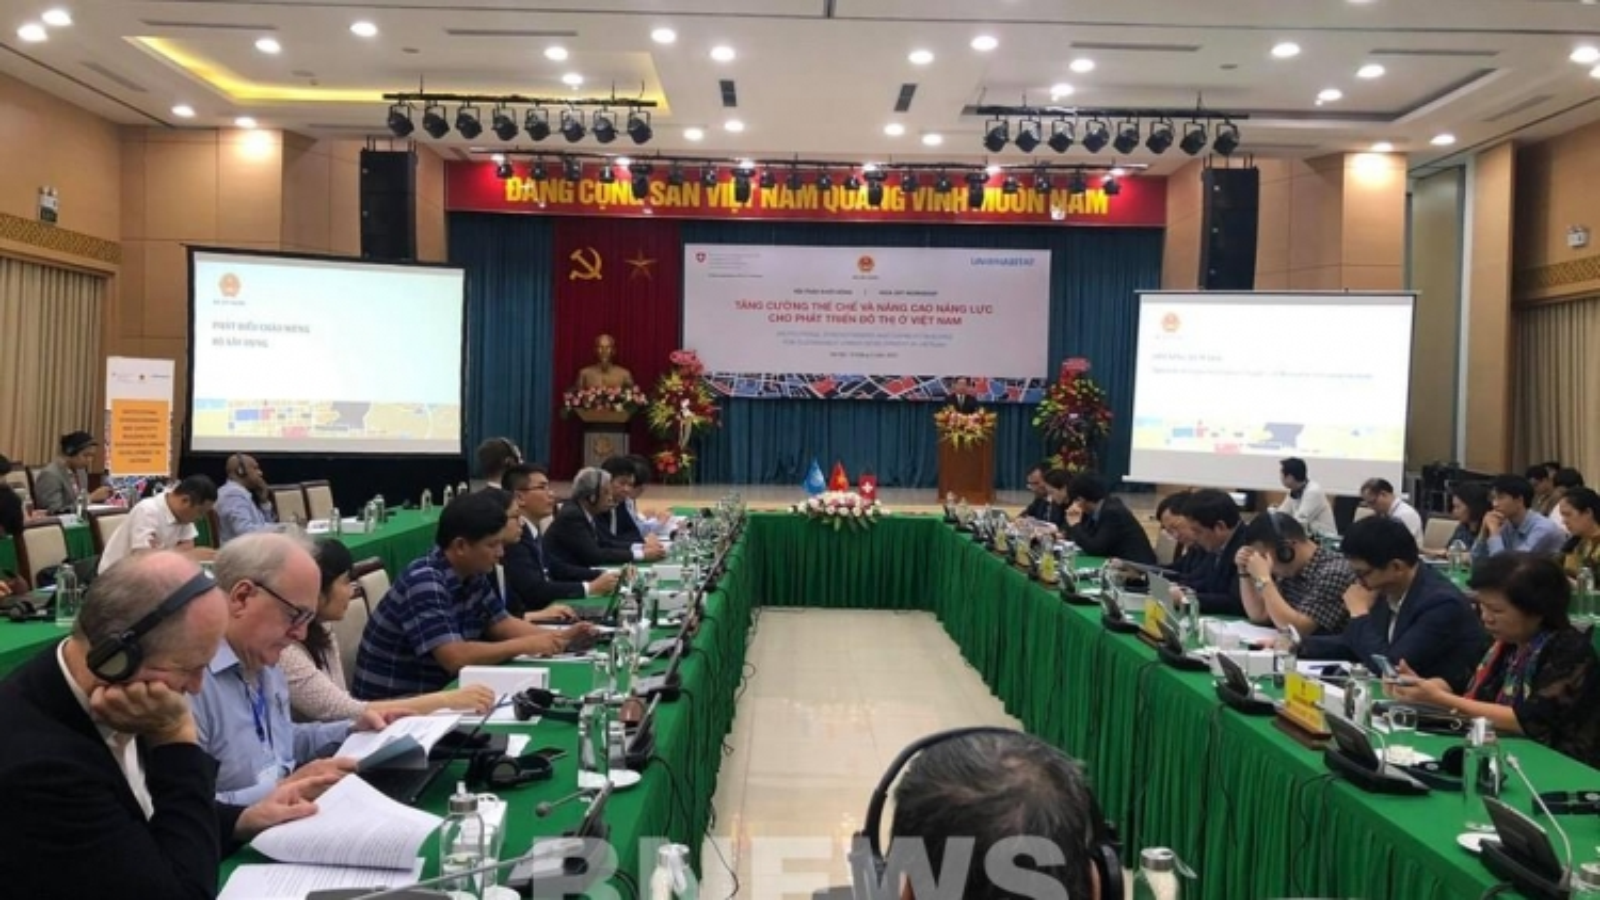 Seminar discusses capacity building for urban development in Vietnam